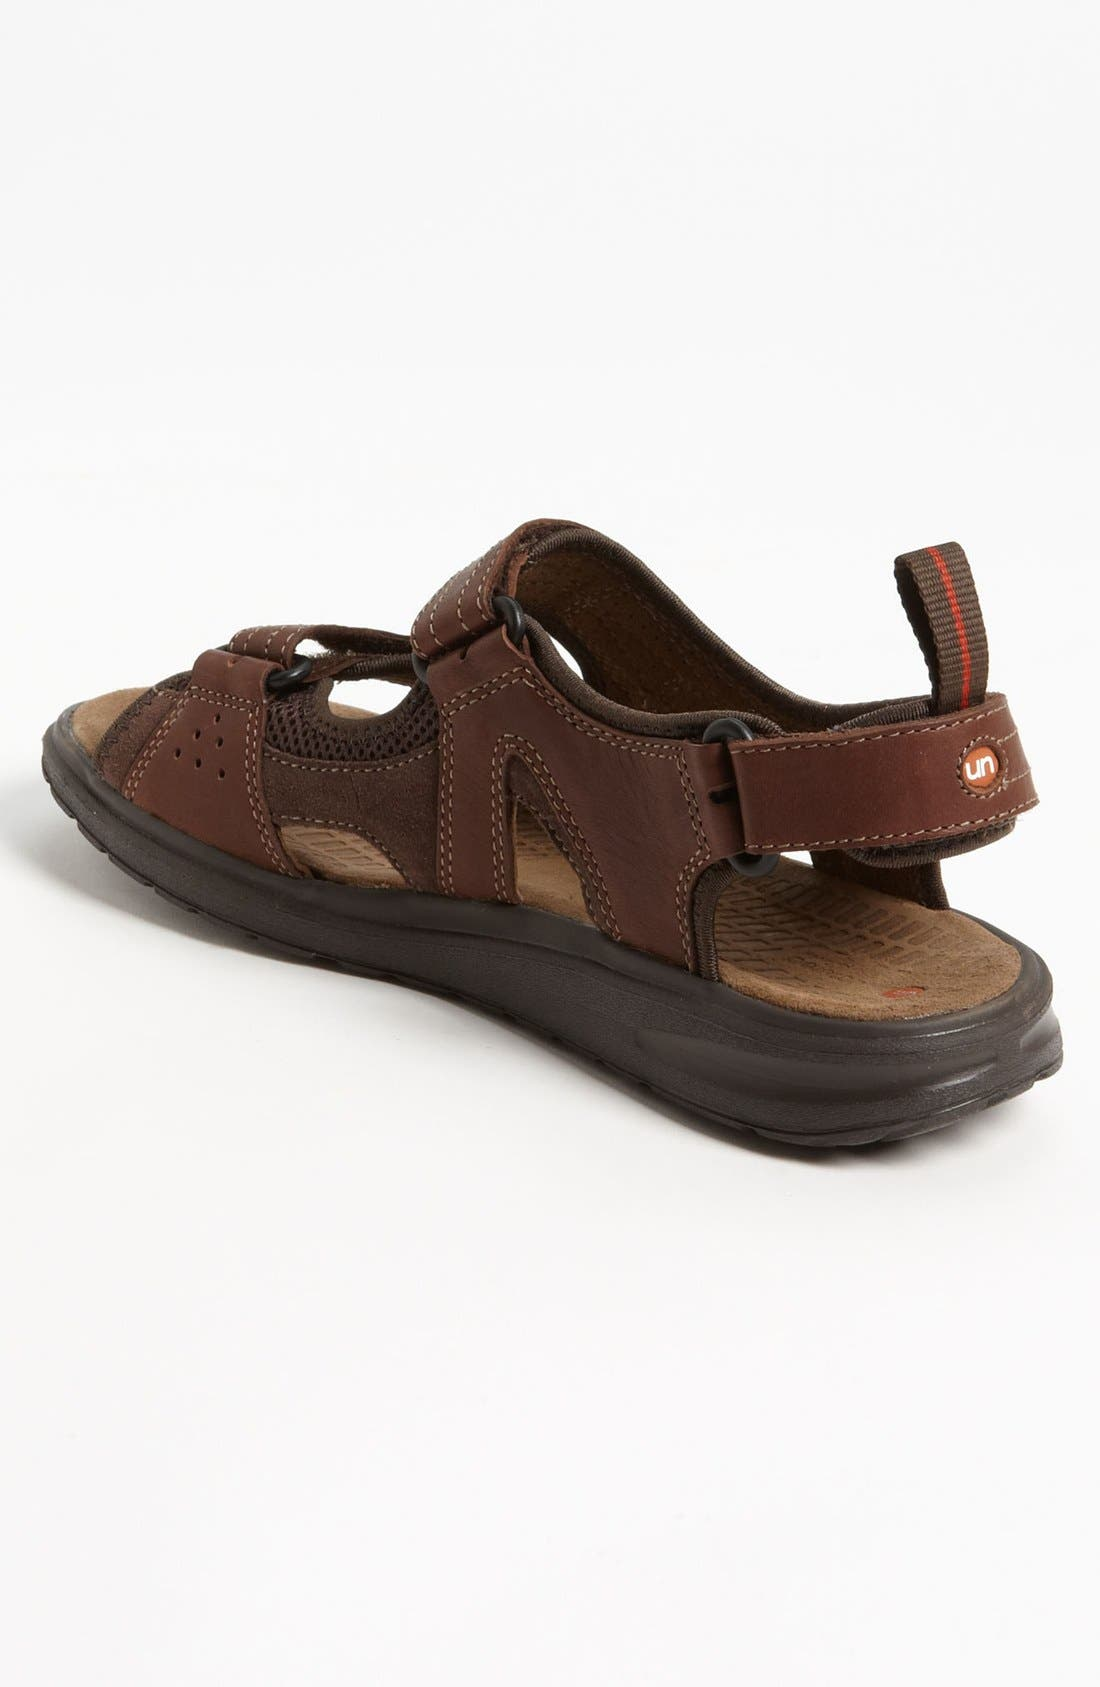 Alternate Image 2  - Clarks® 'Unstructured - Caicos' Sandal   (Men)